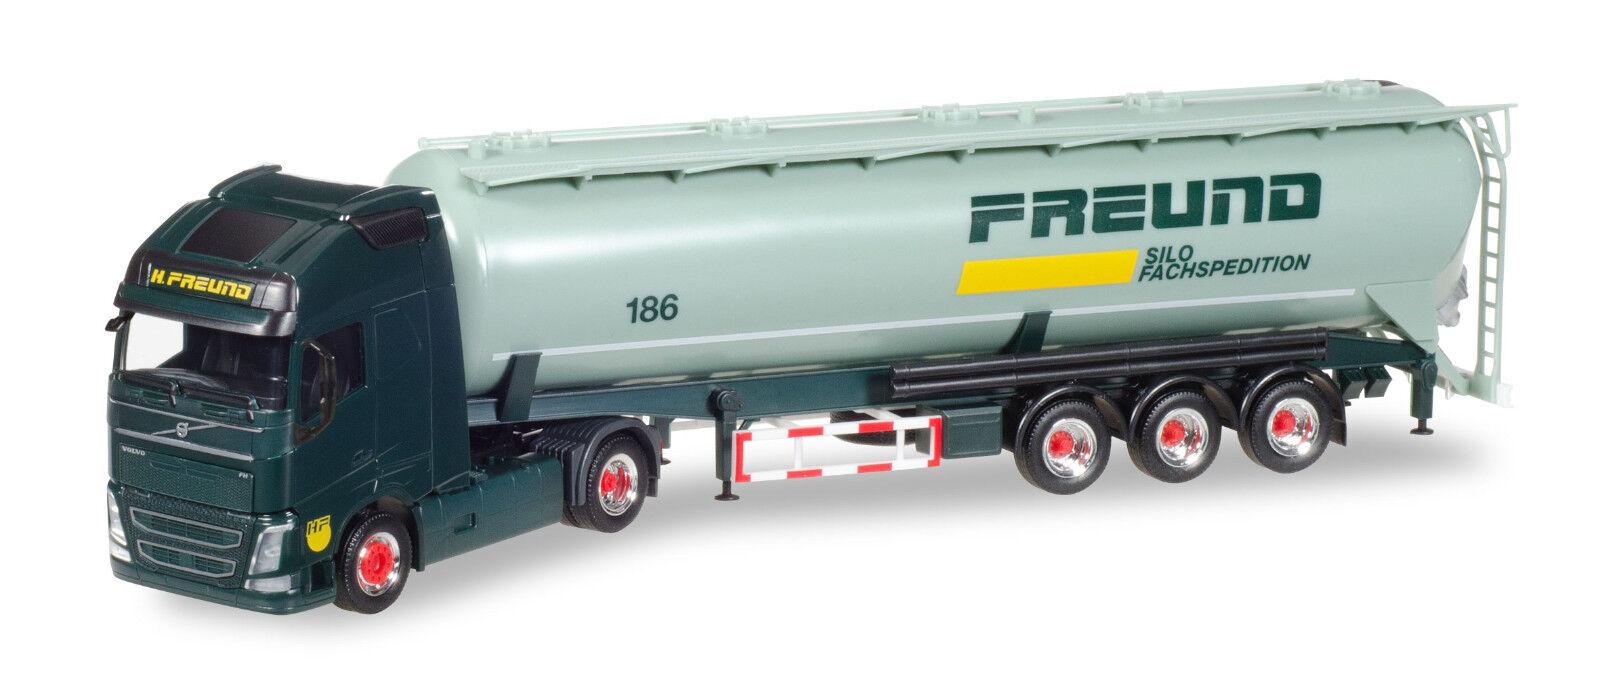 Herpa 308168 Vovo Fh Gl XL Silo Semitrailer   Freund   Ho 1 87 New